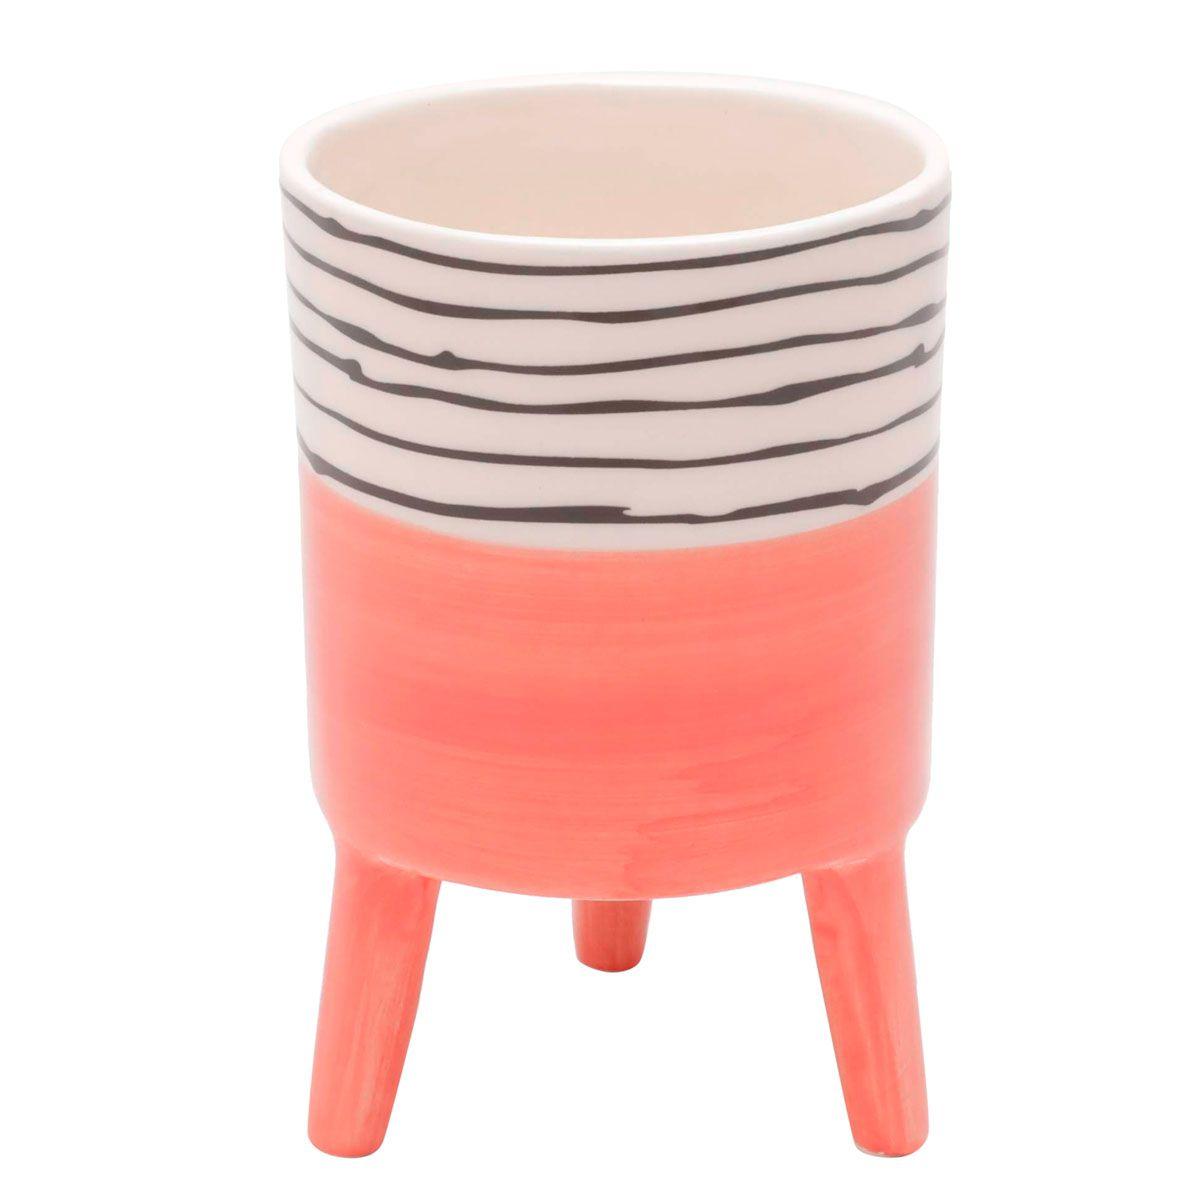 Kit 2 Vasos Cachepot de Cerâmica Bright Colors Salmão